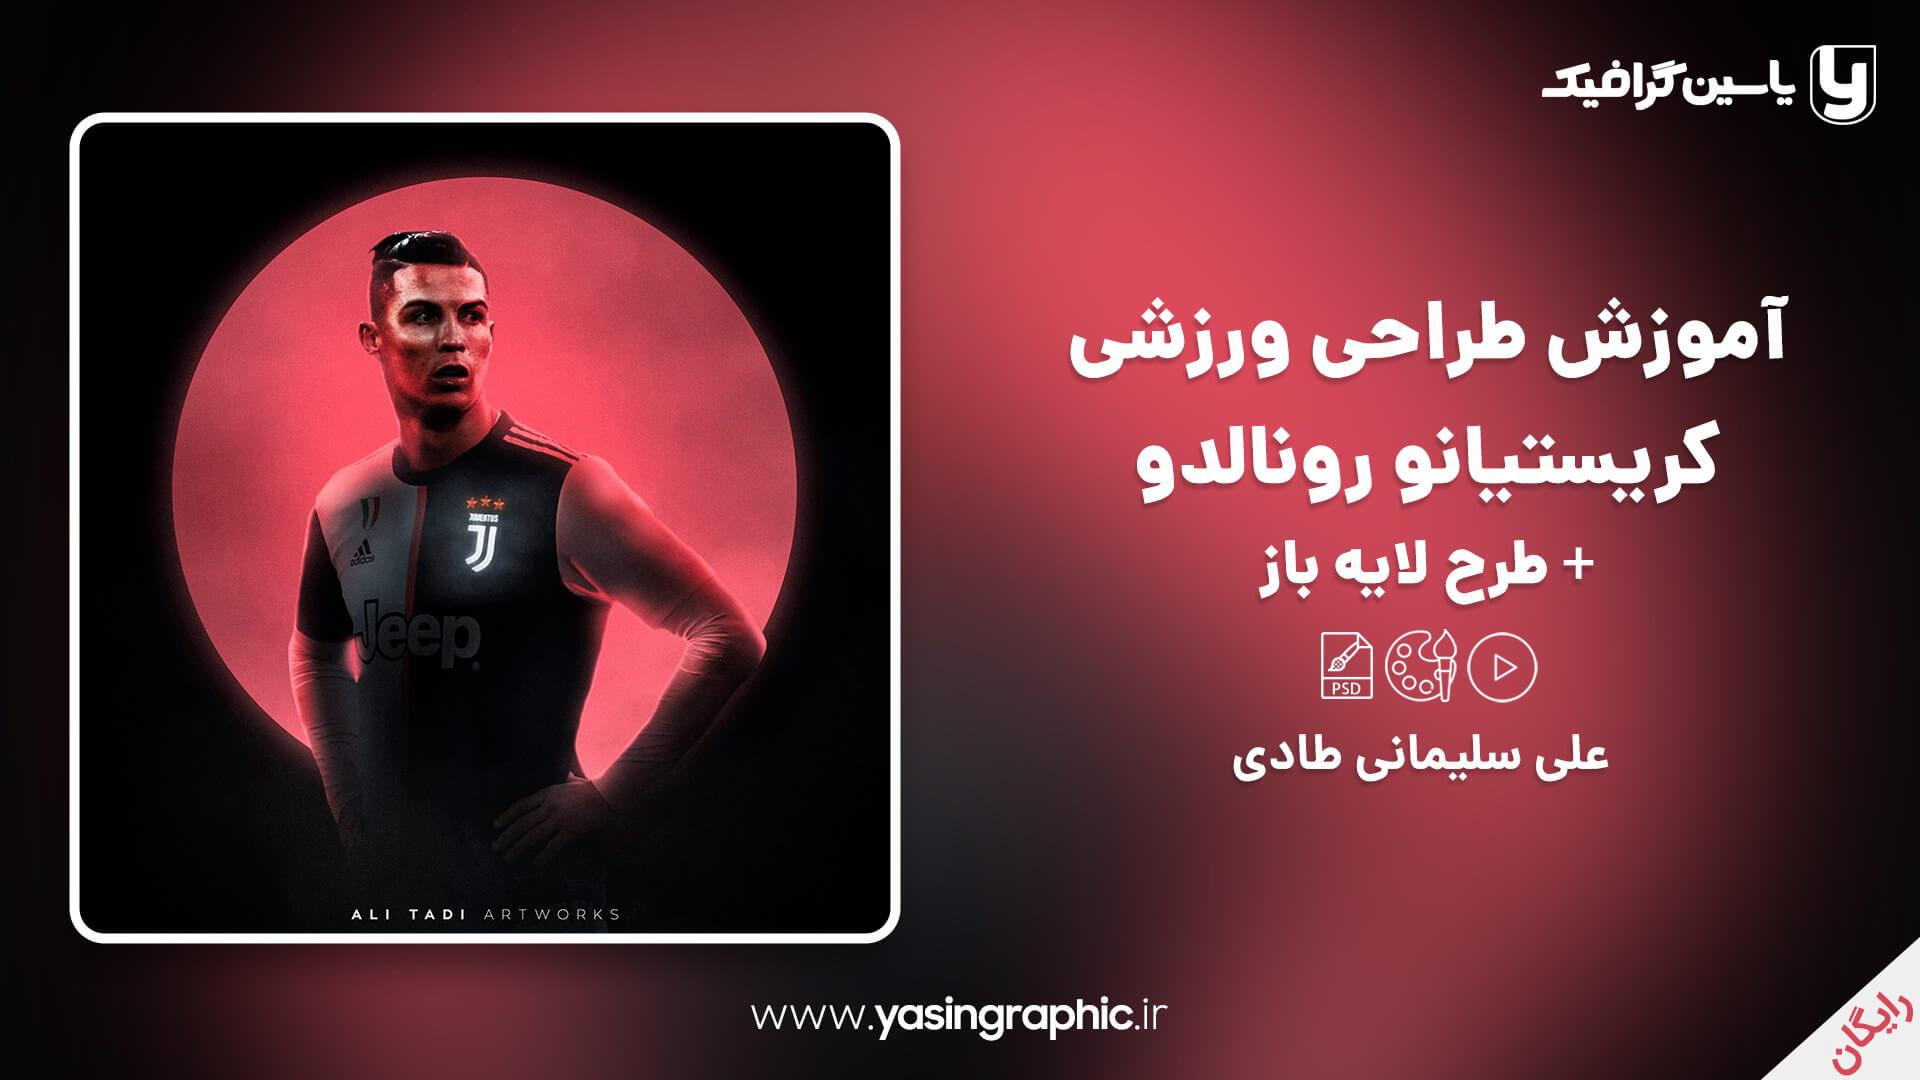 Design training by Cristiano Ronaldo